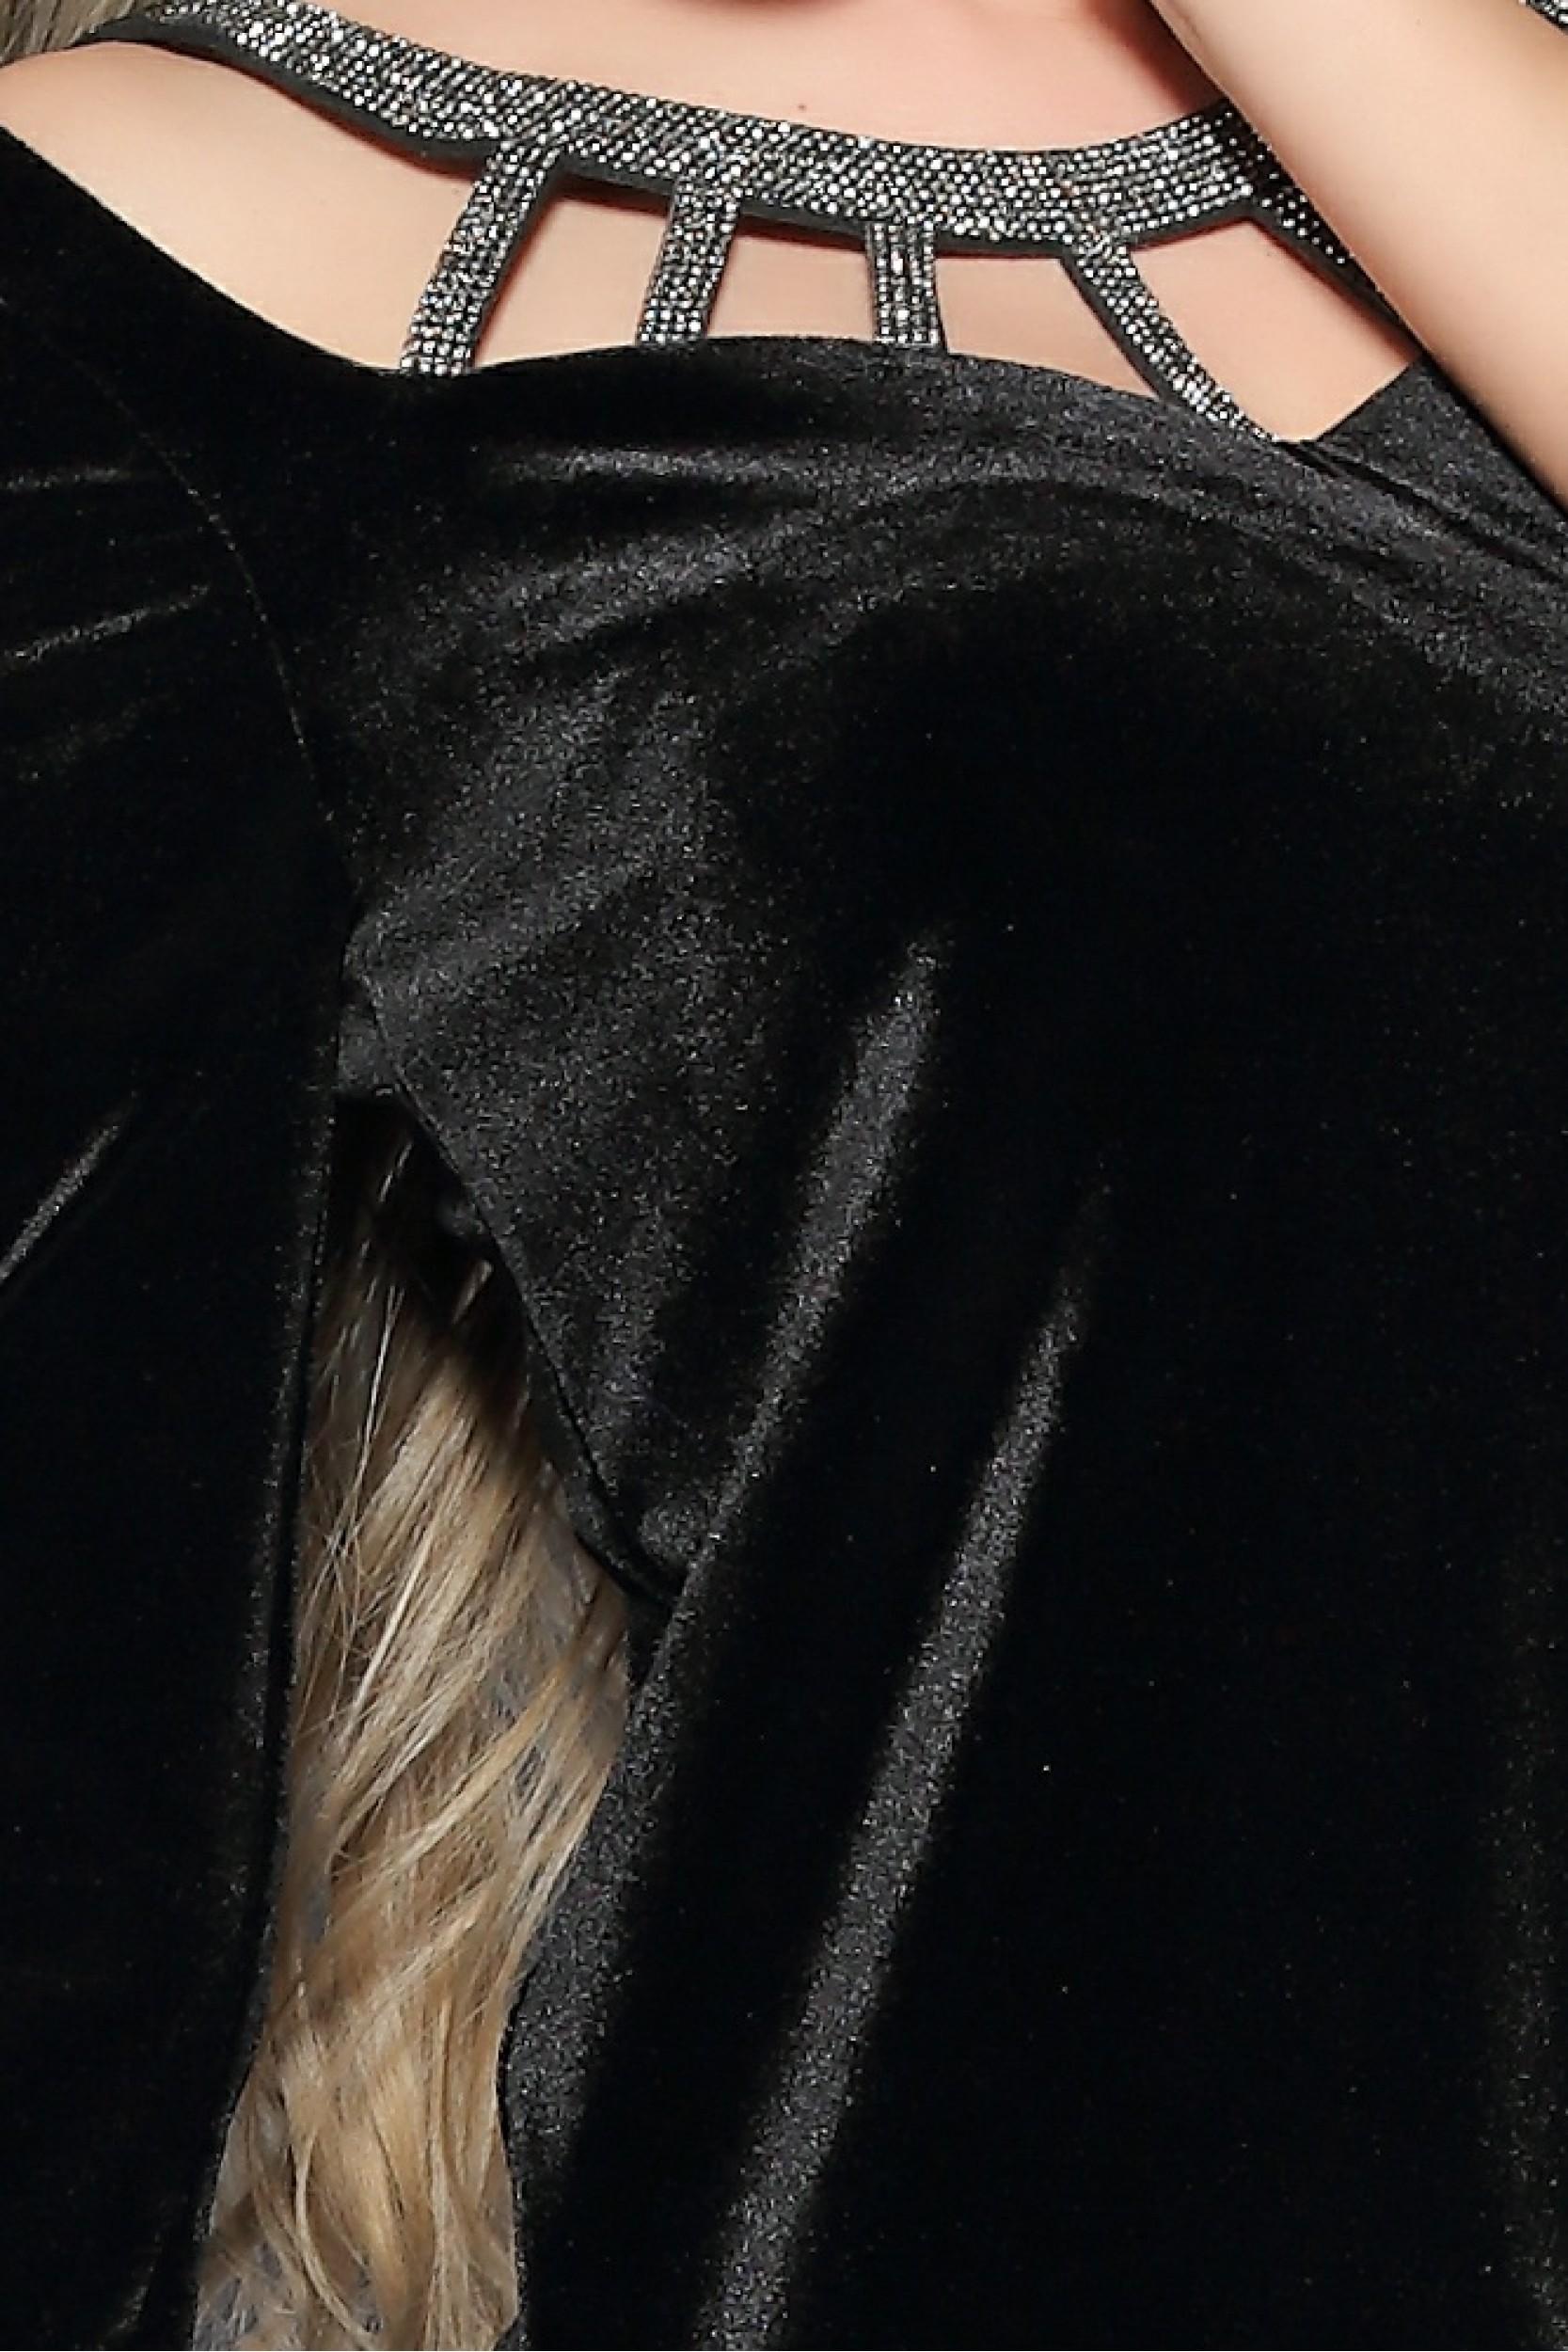 Rochie cu decupaje accesorizate